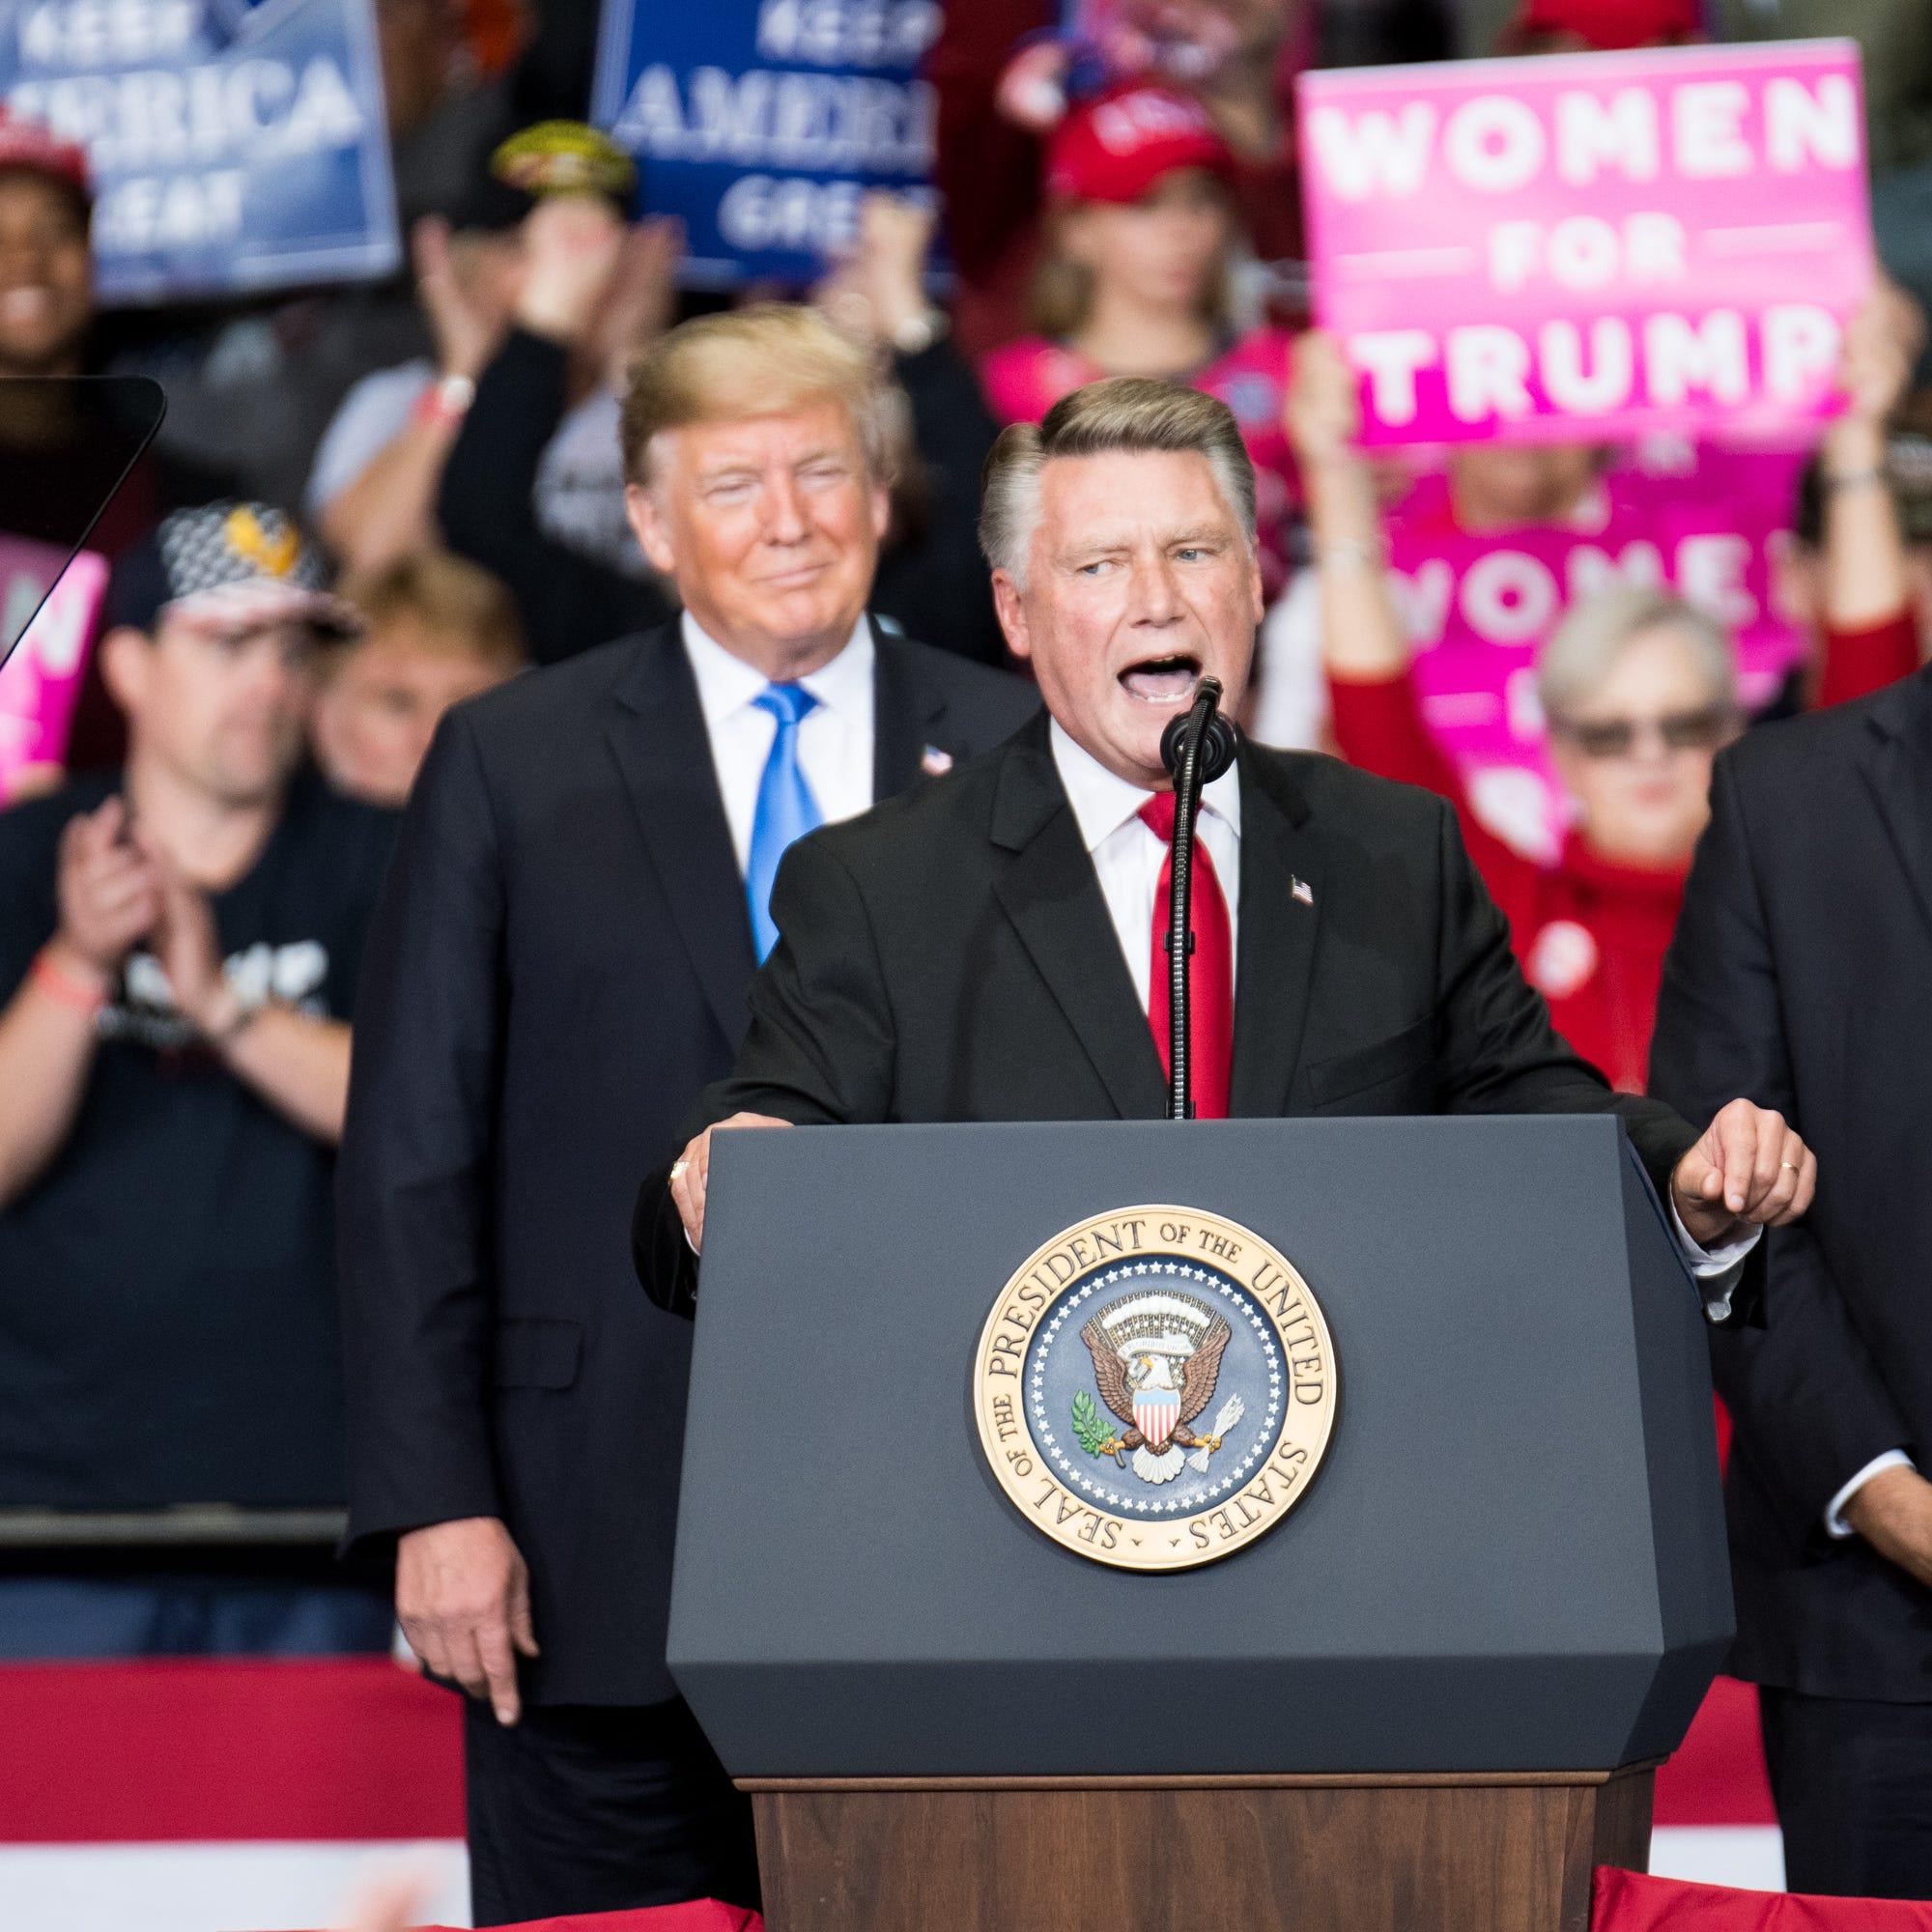 North Carolina vote fraud raises questions for GOP